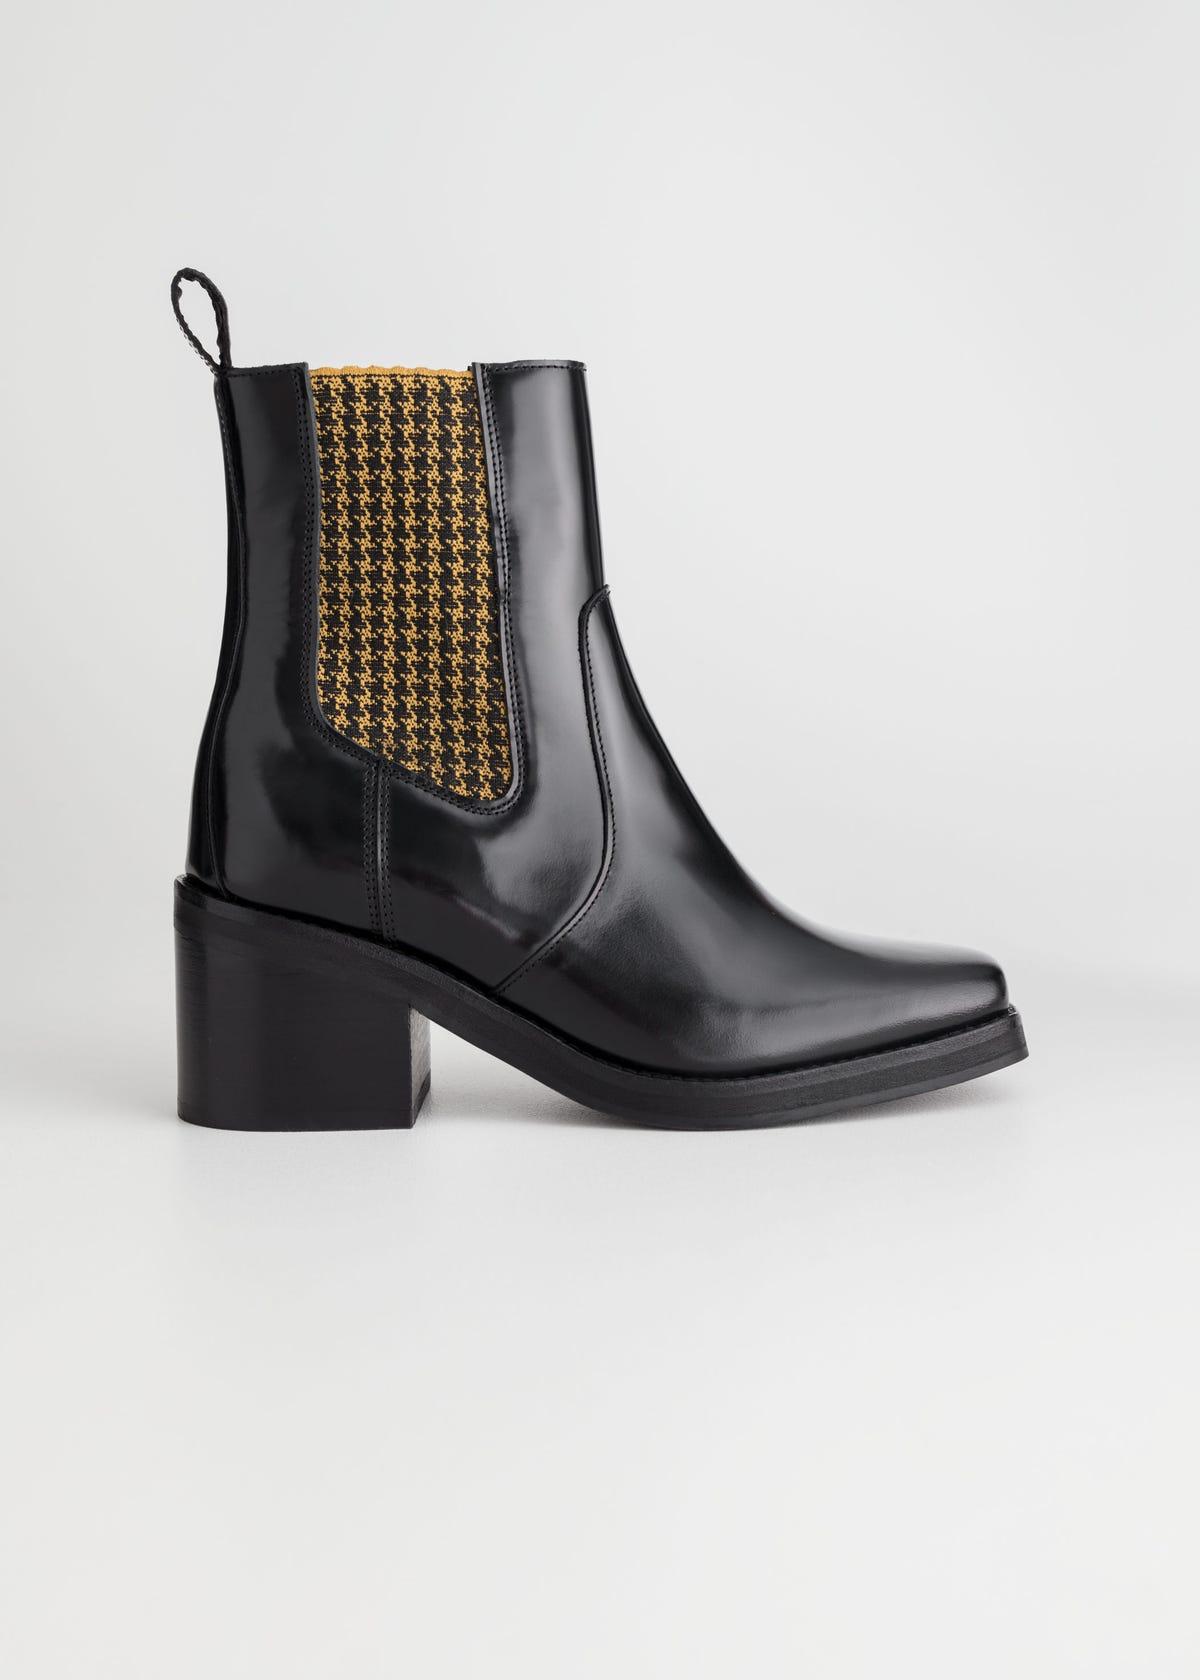 6b03973926 Womens Boots Trends - Best Winter 2019 Boot Styles